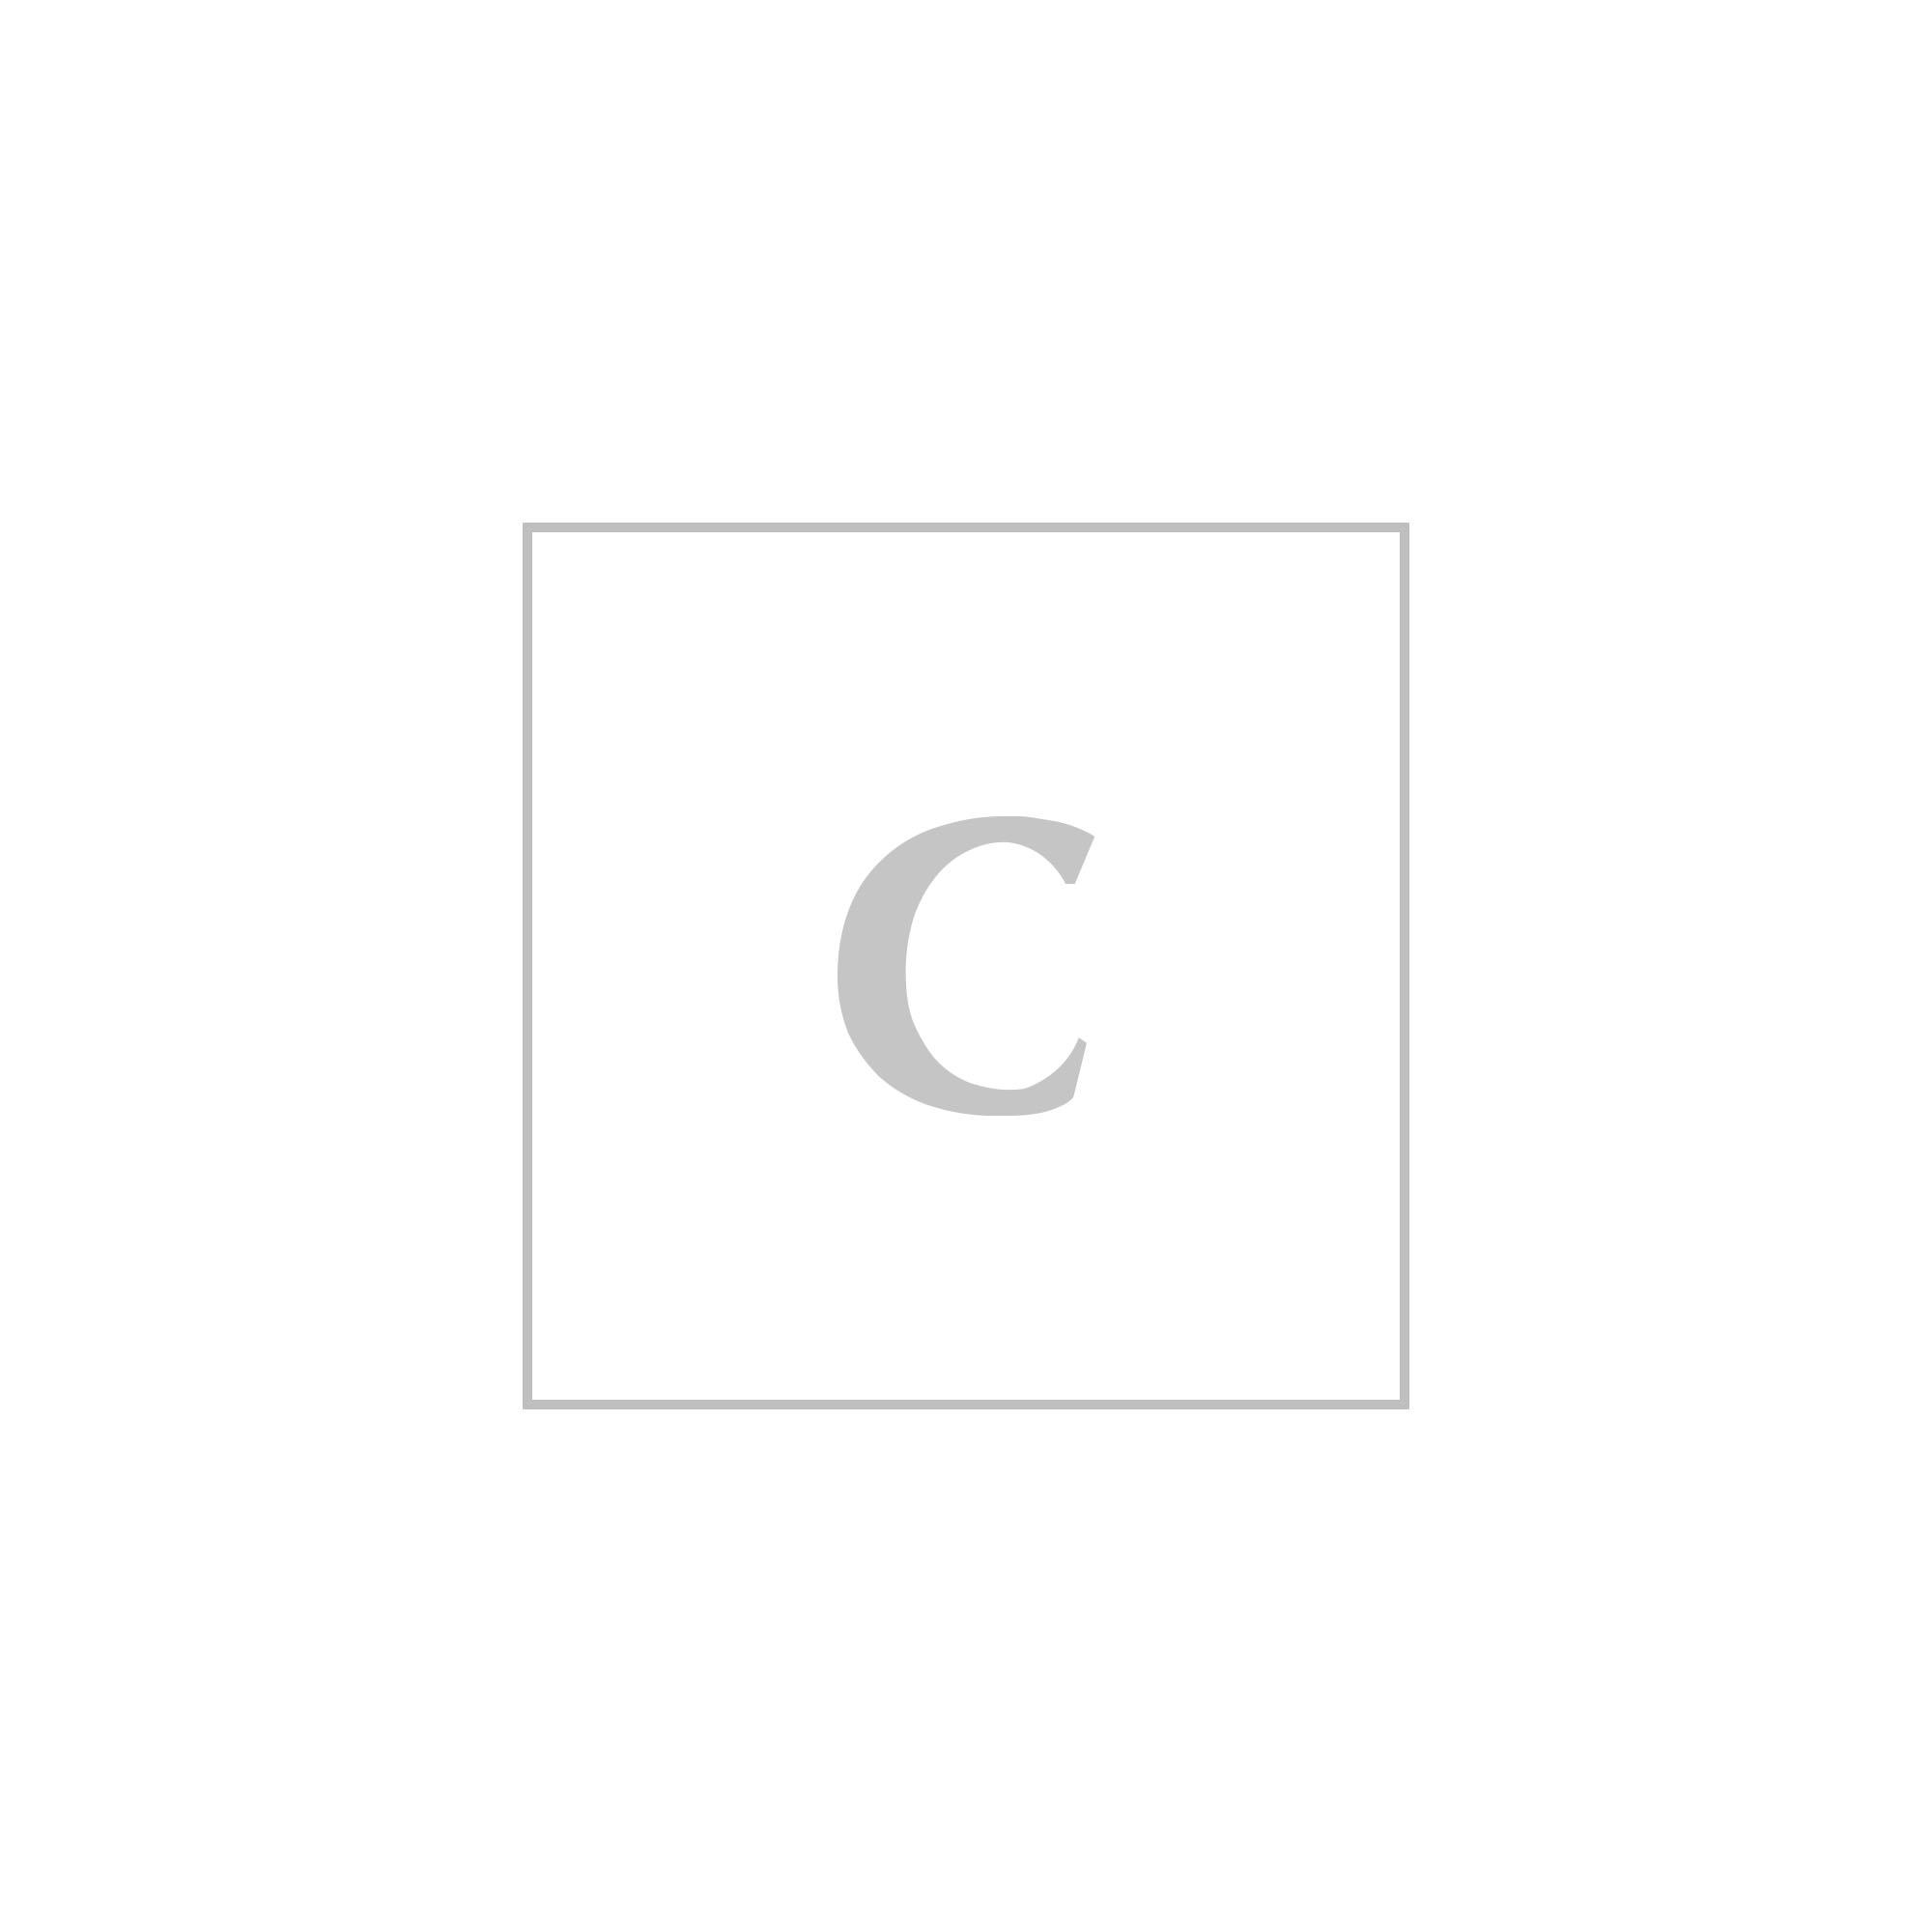 Heron preston ctnmb knit beanie